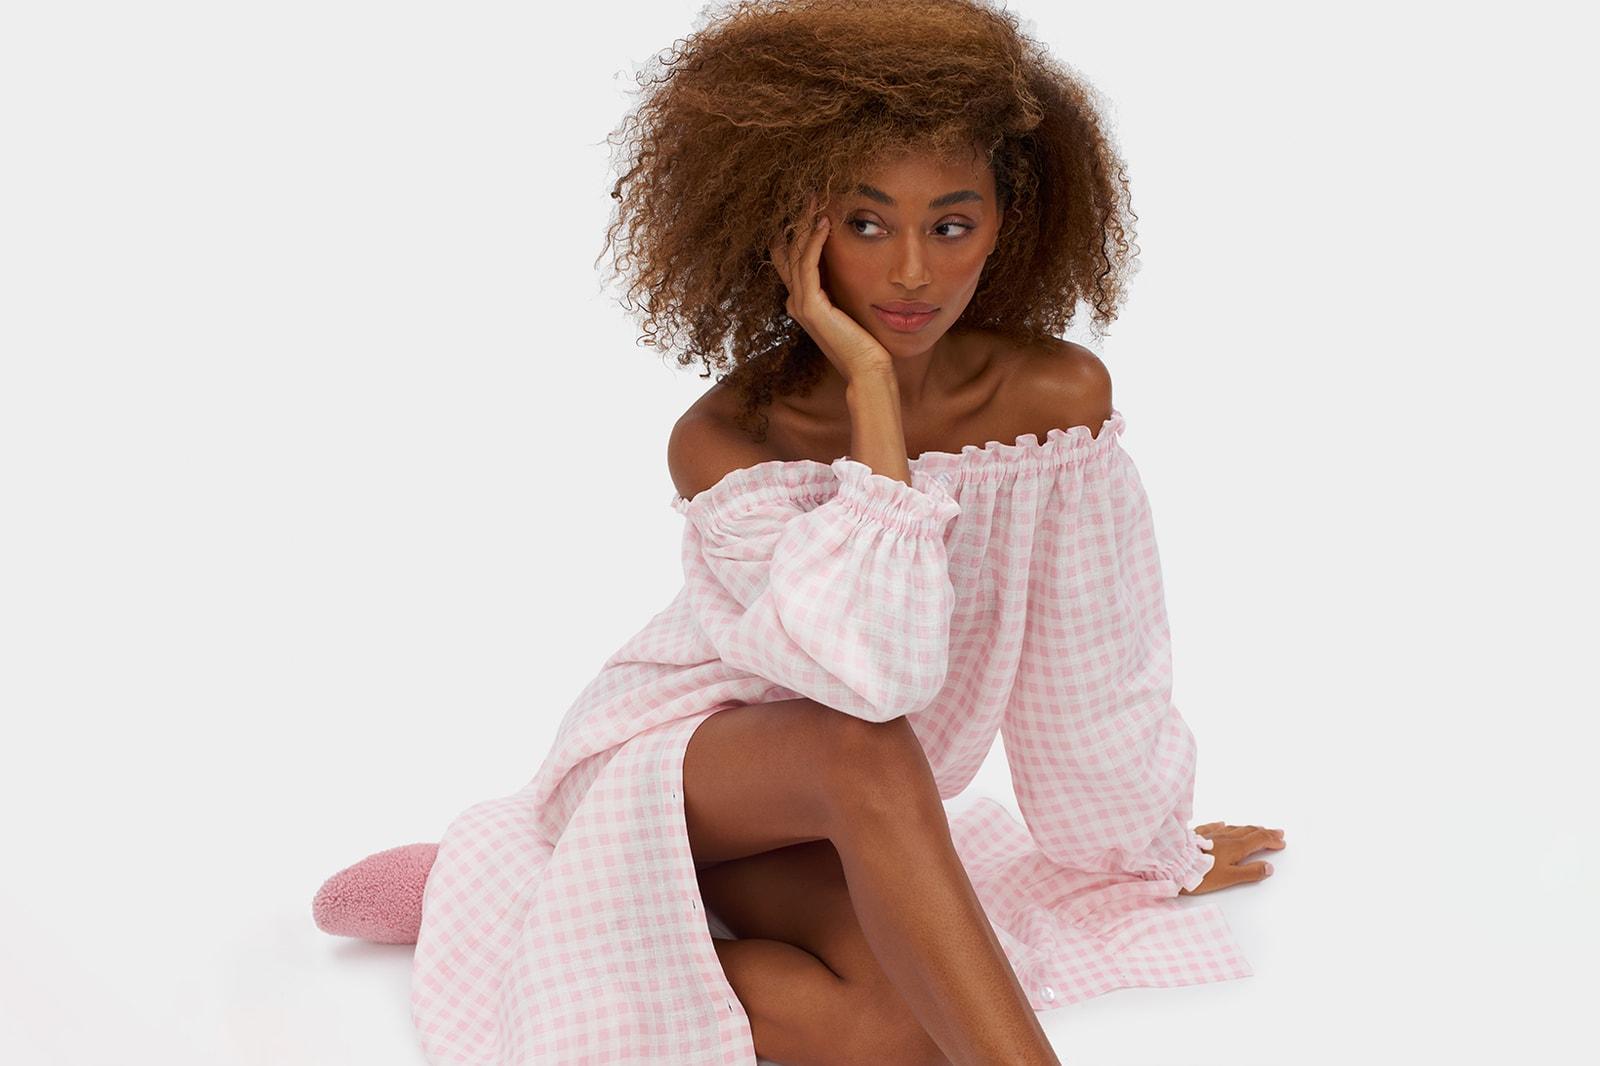 breast cancer awareness month 2021 araks lingerie brand red bra underwear charity donation